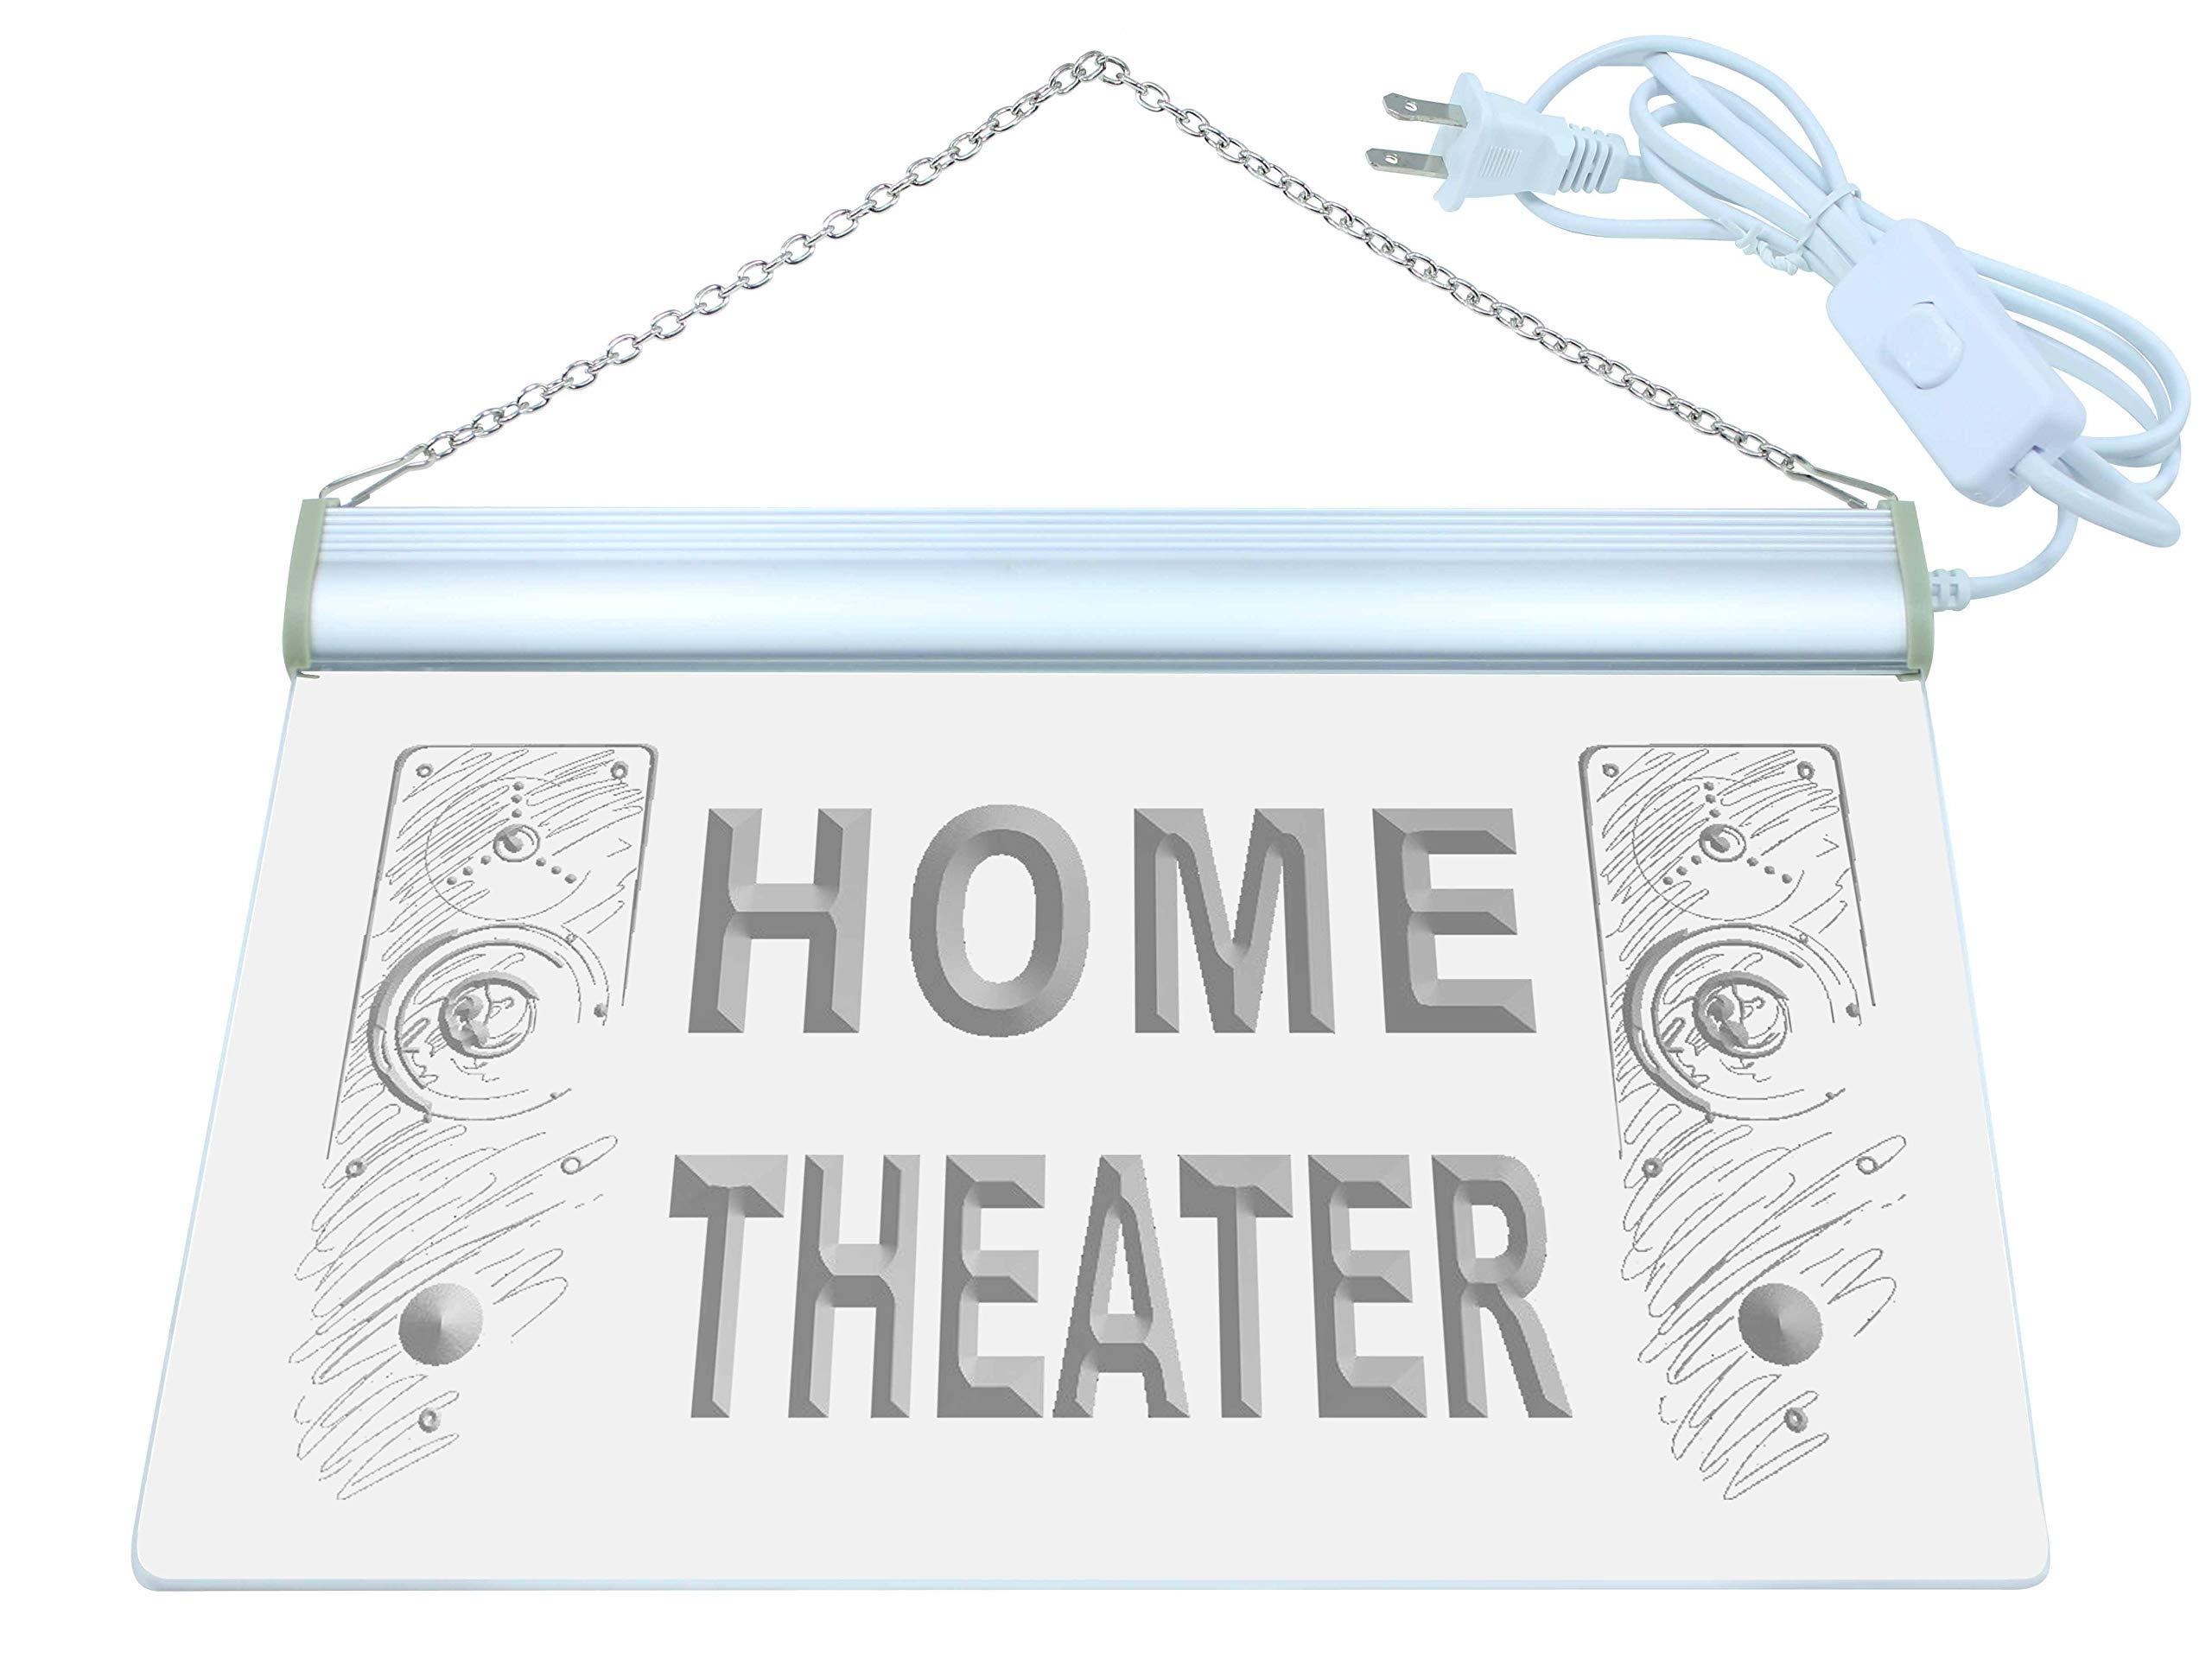 ADV PRO Home Theater Speaker Hi Fi Audio LED Neon Sign Green 12'' x 8.5'' st4s32-j108-g